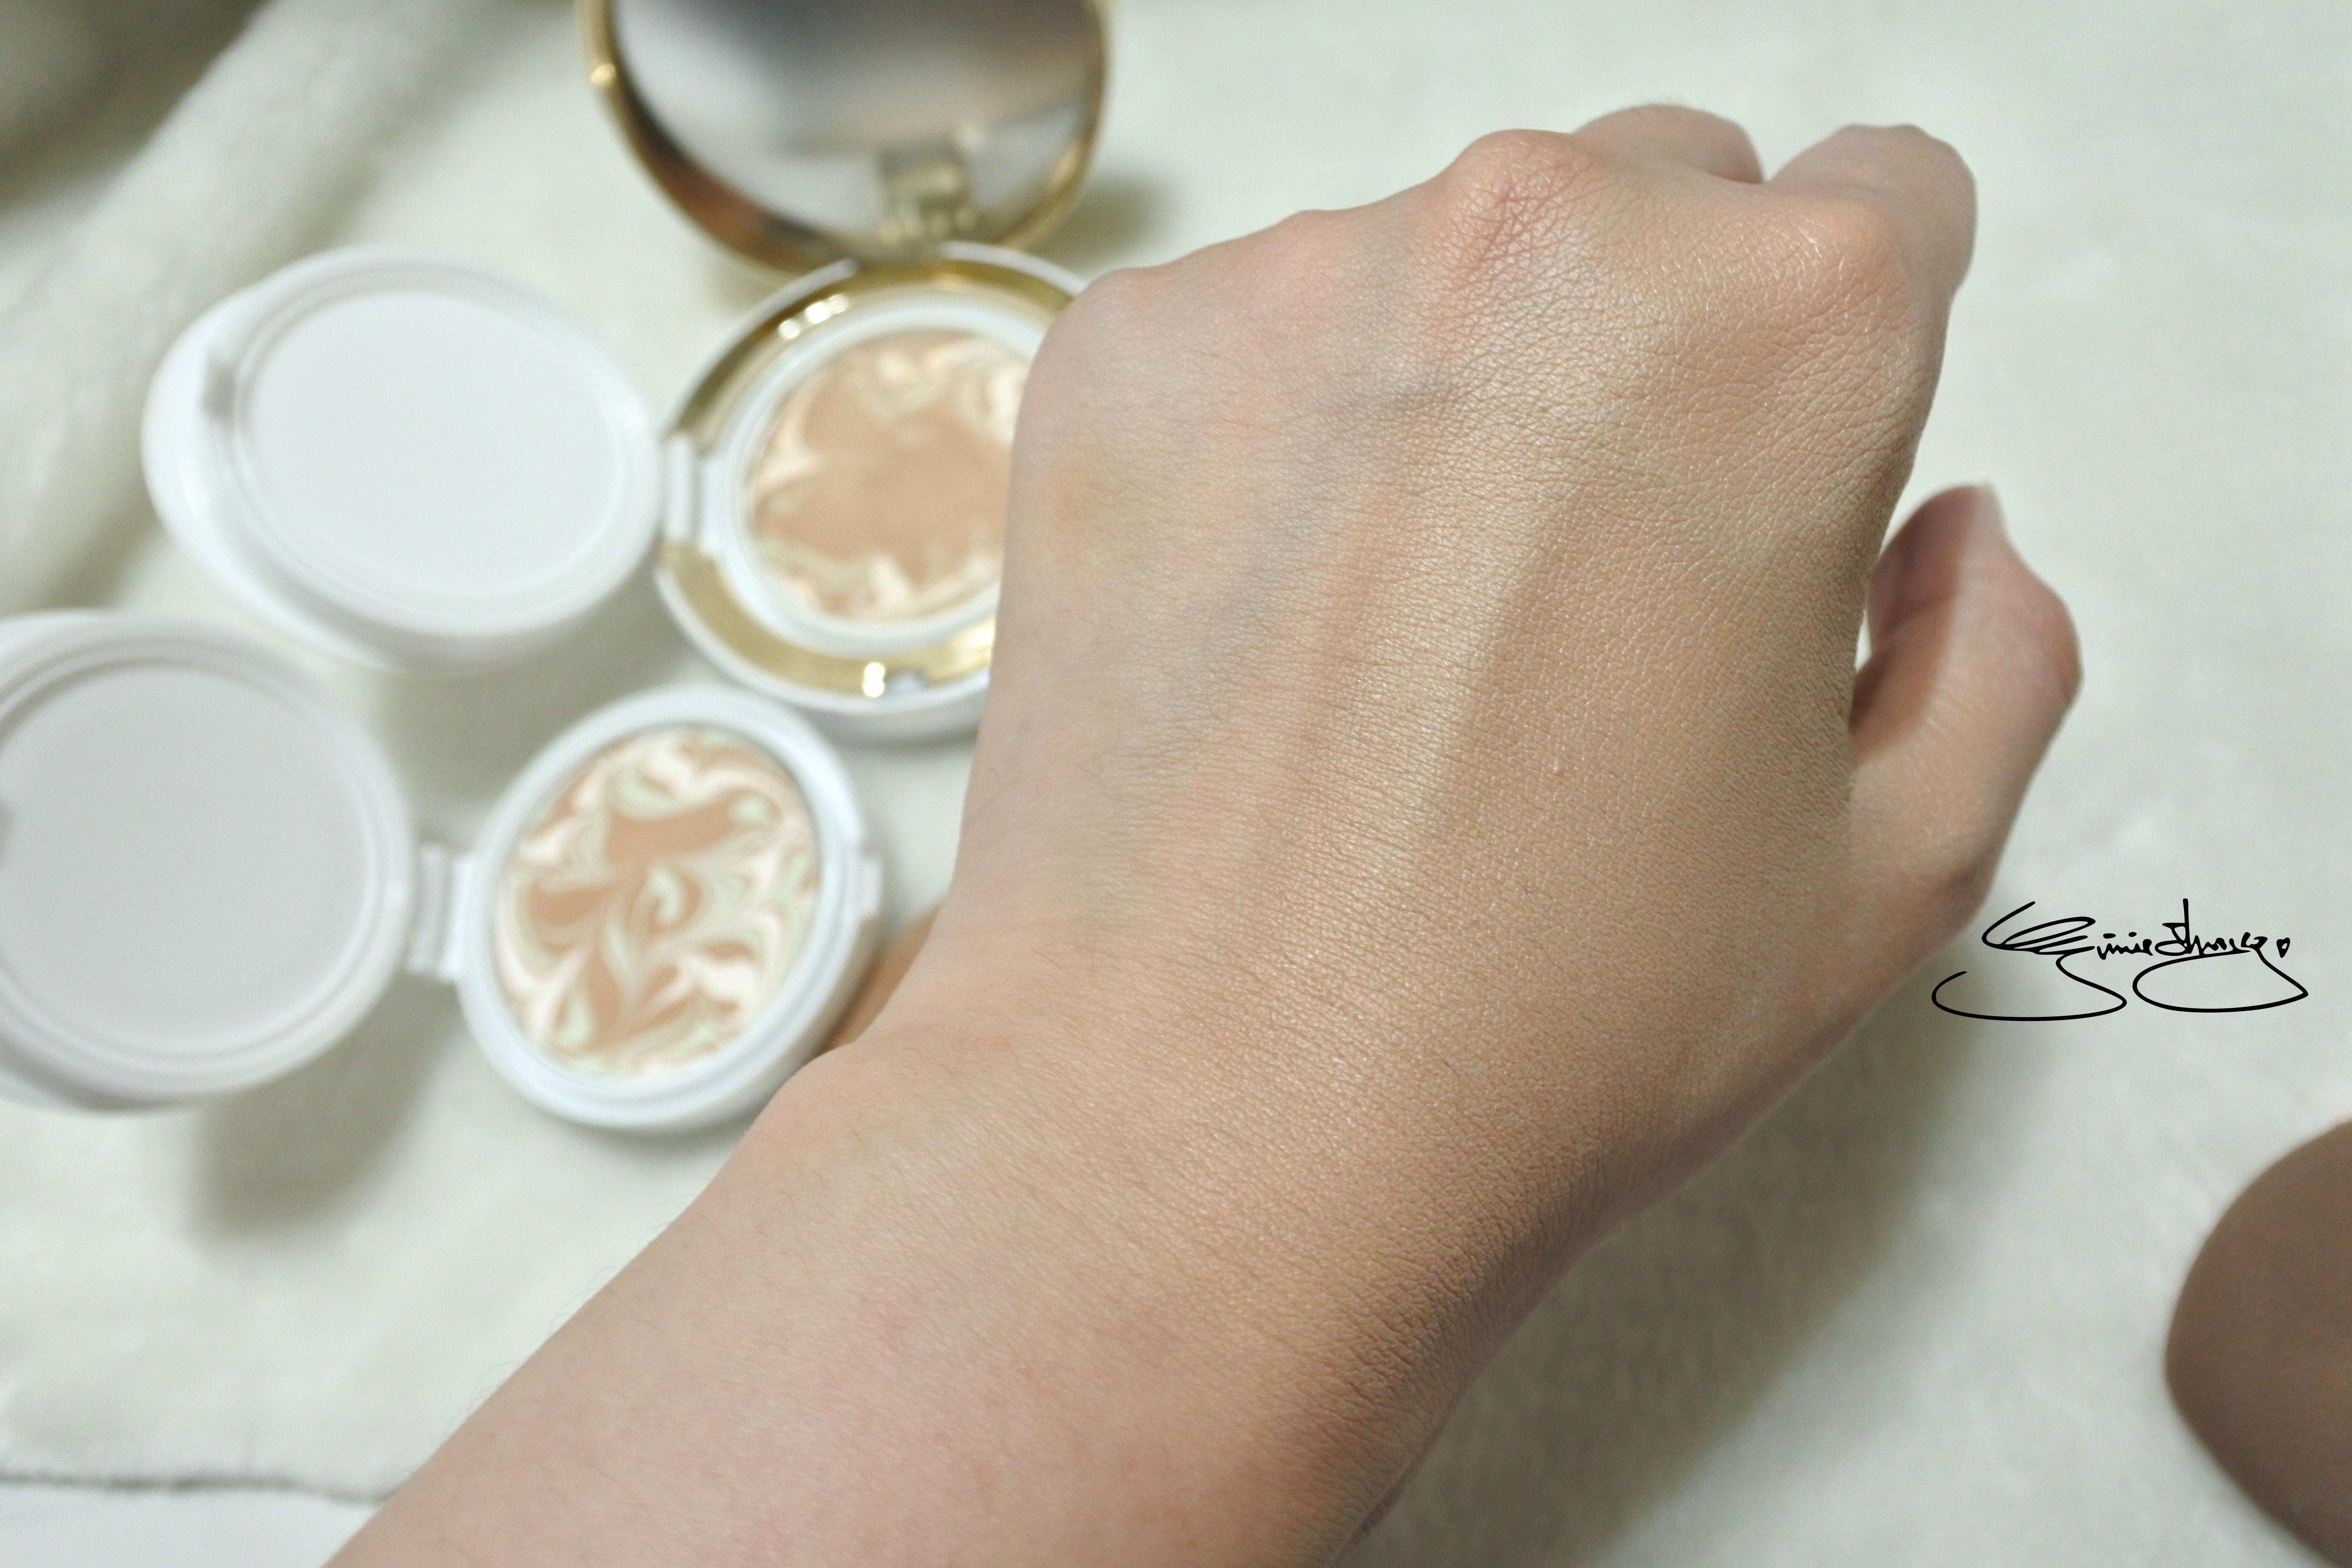 AGE20%5Cs 瓷透肌聚焦爆水粉餅 遮瑕